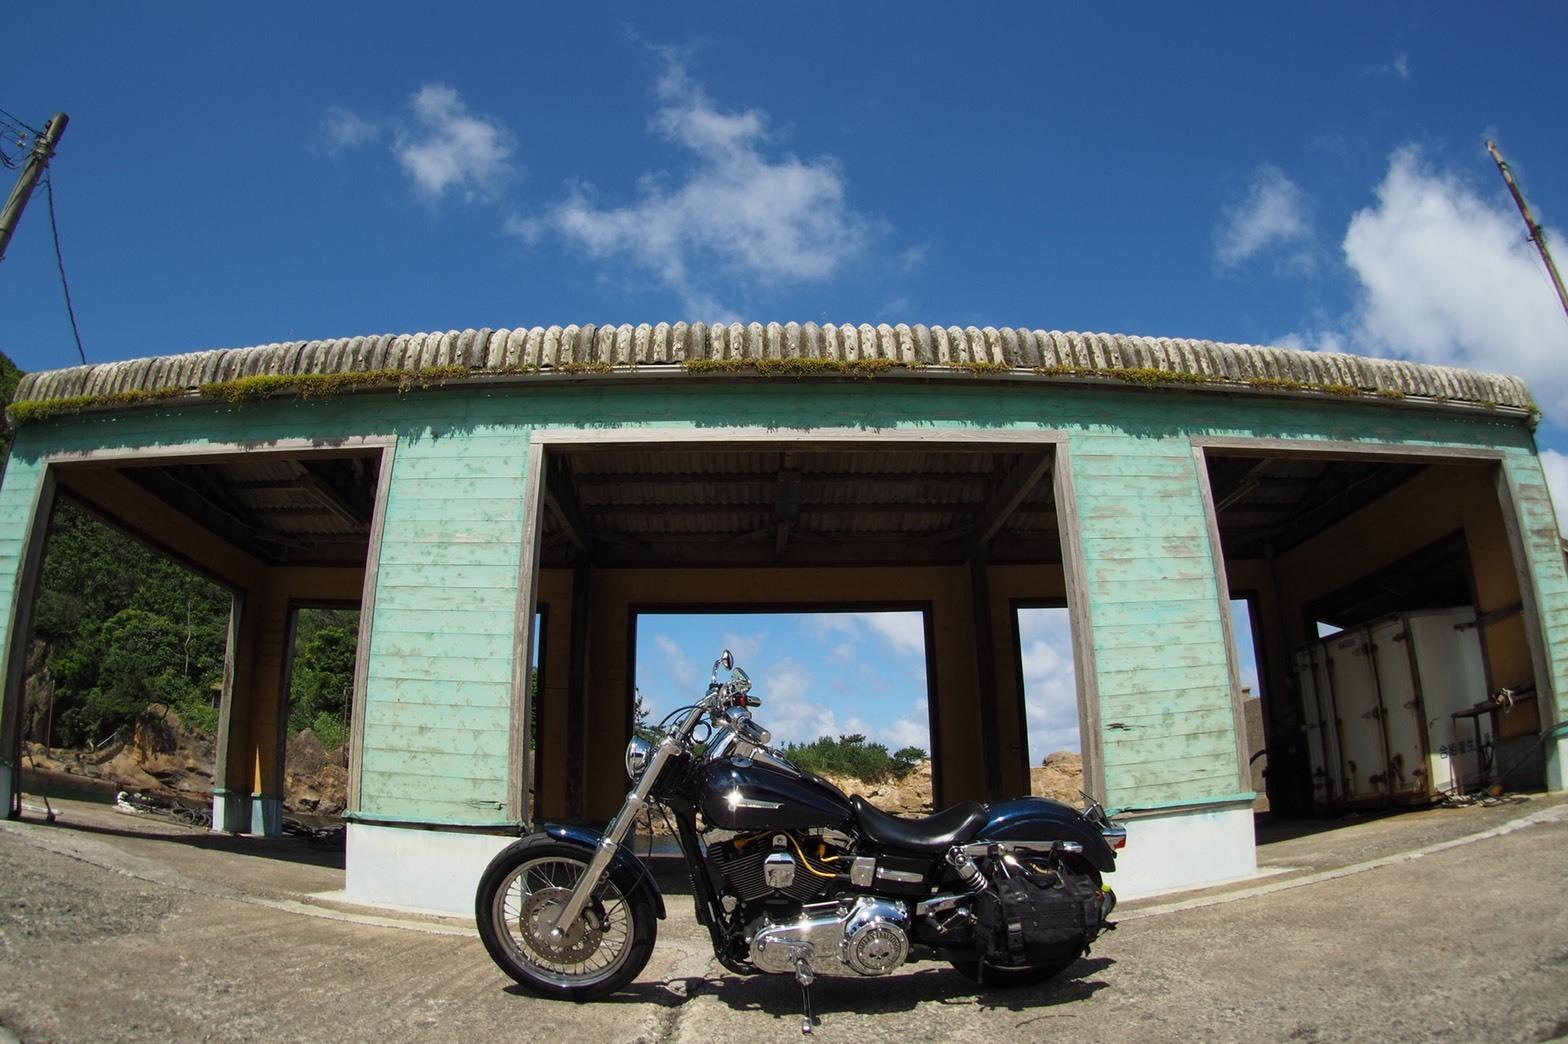 harleydavidson-motorcycle-touring-blog-kyoto-tanngopeninsula-fishingport-2.jpg